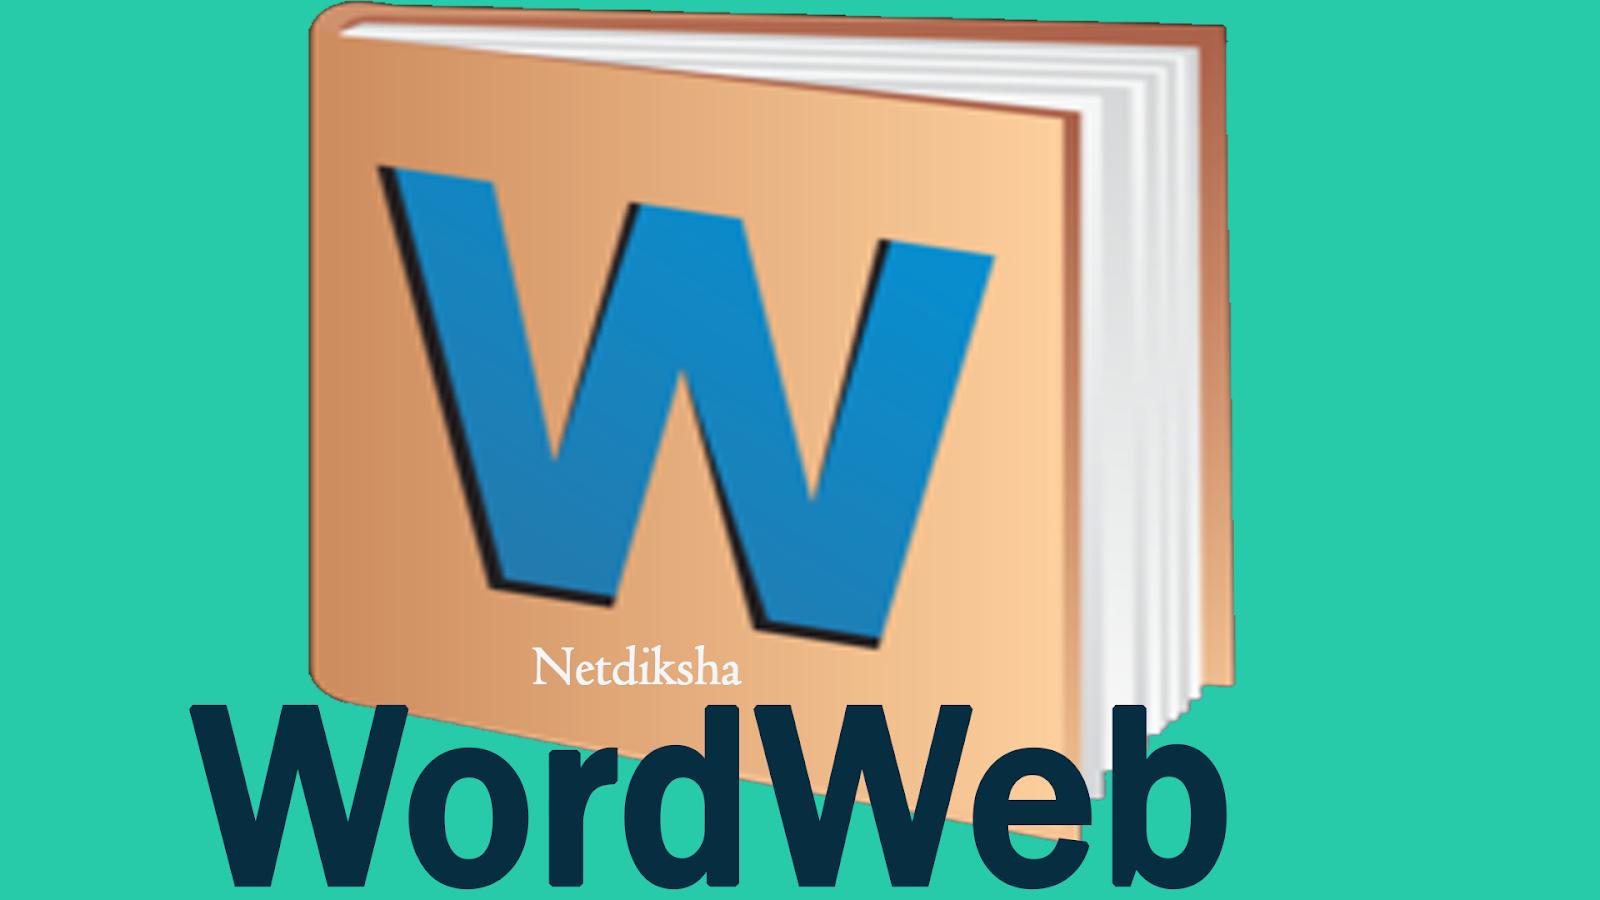 What is WordWeb ? WebWord is an online International English